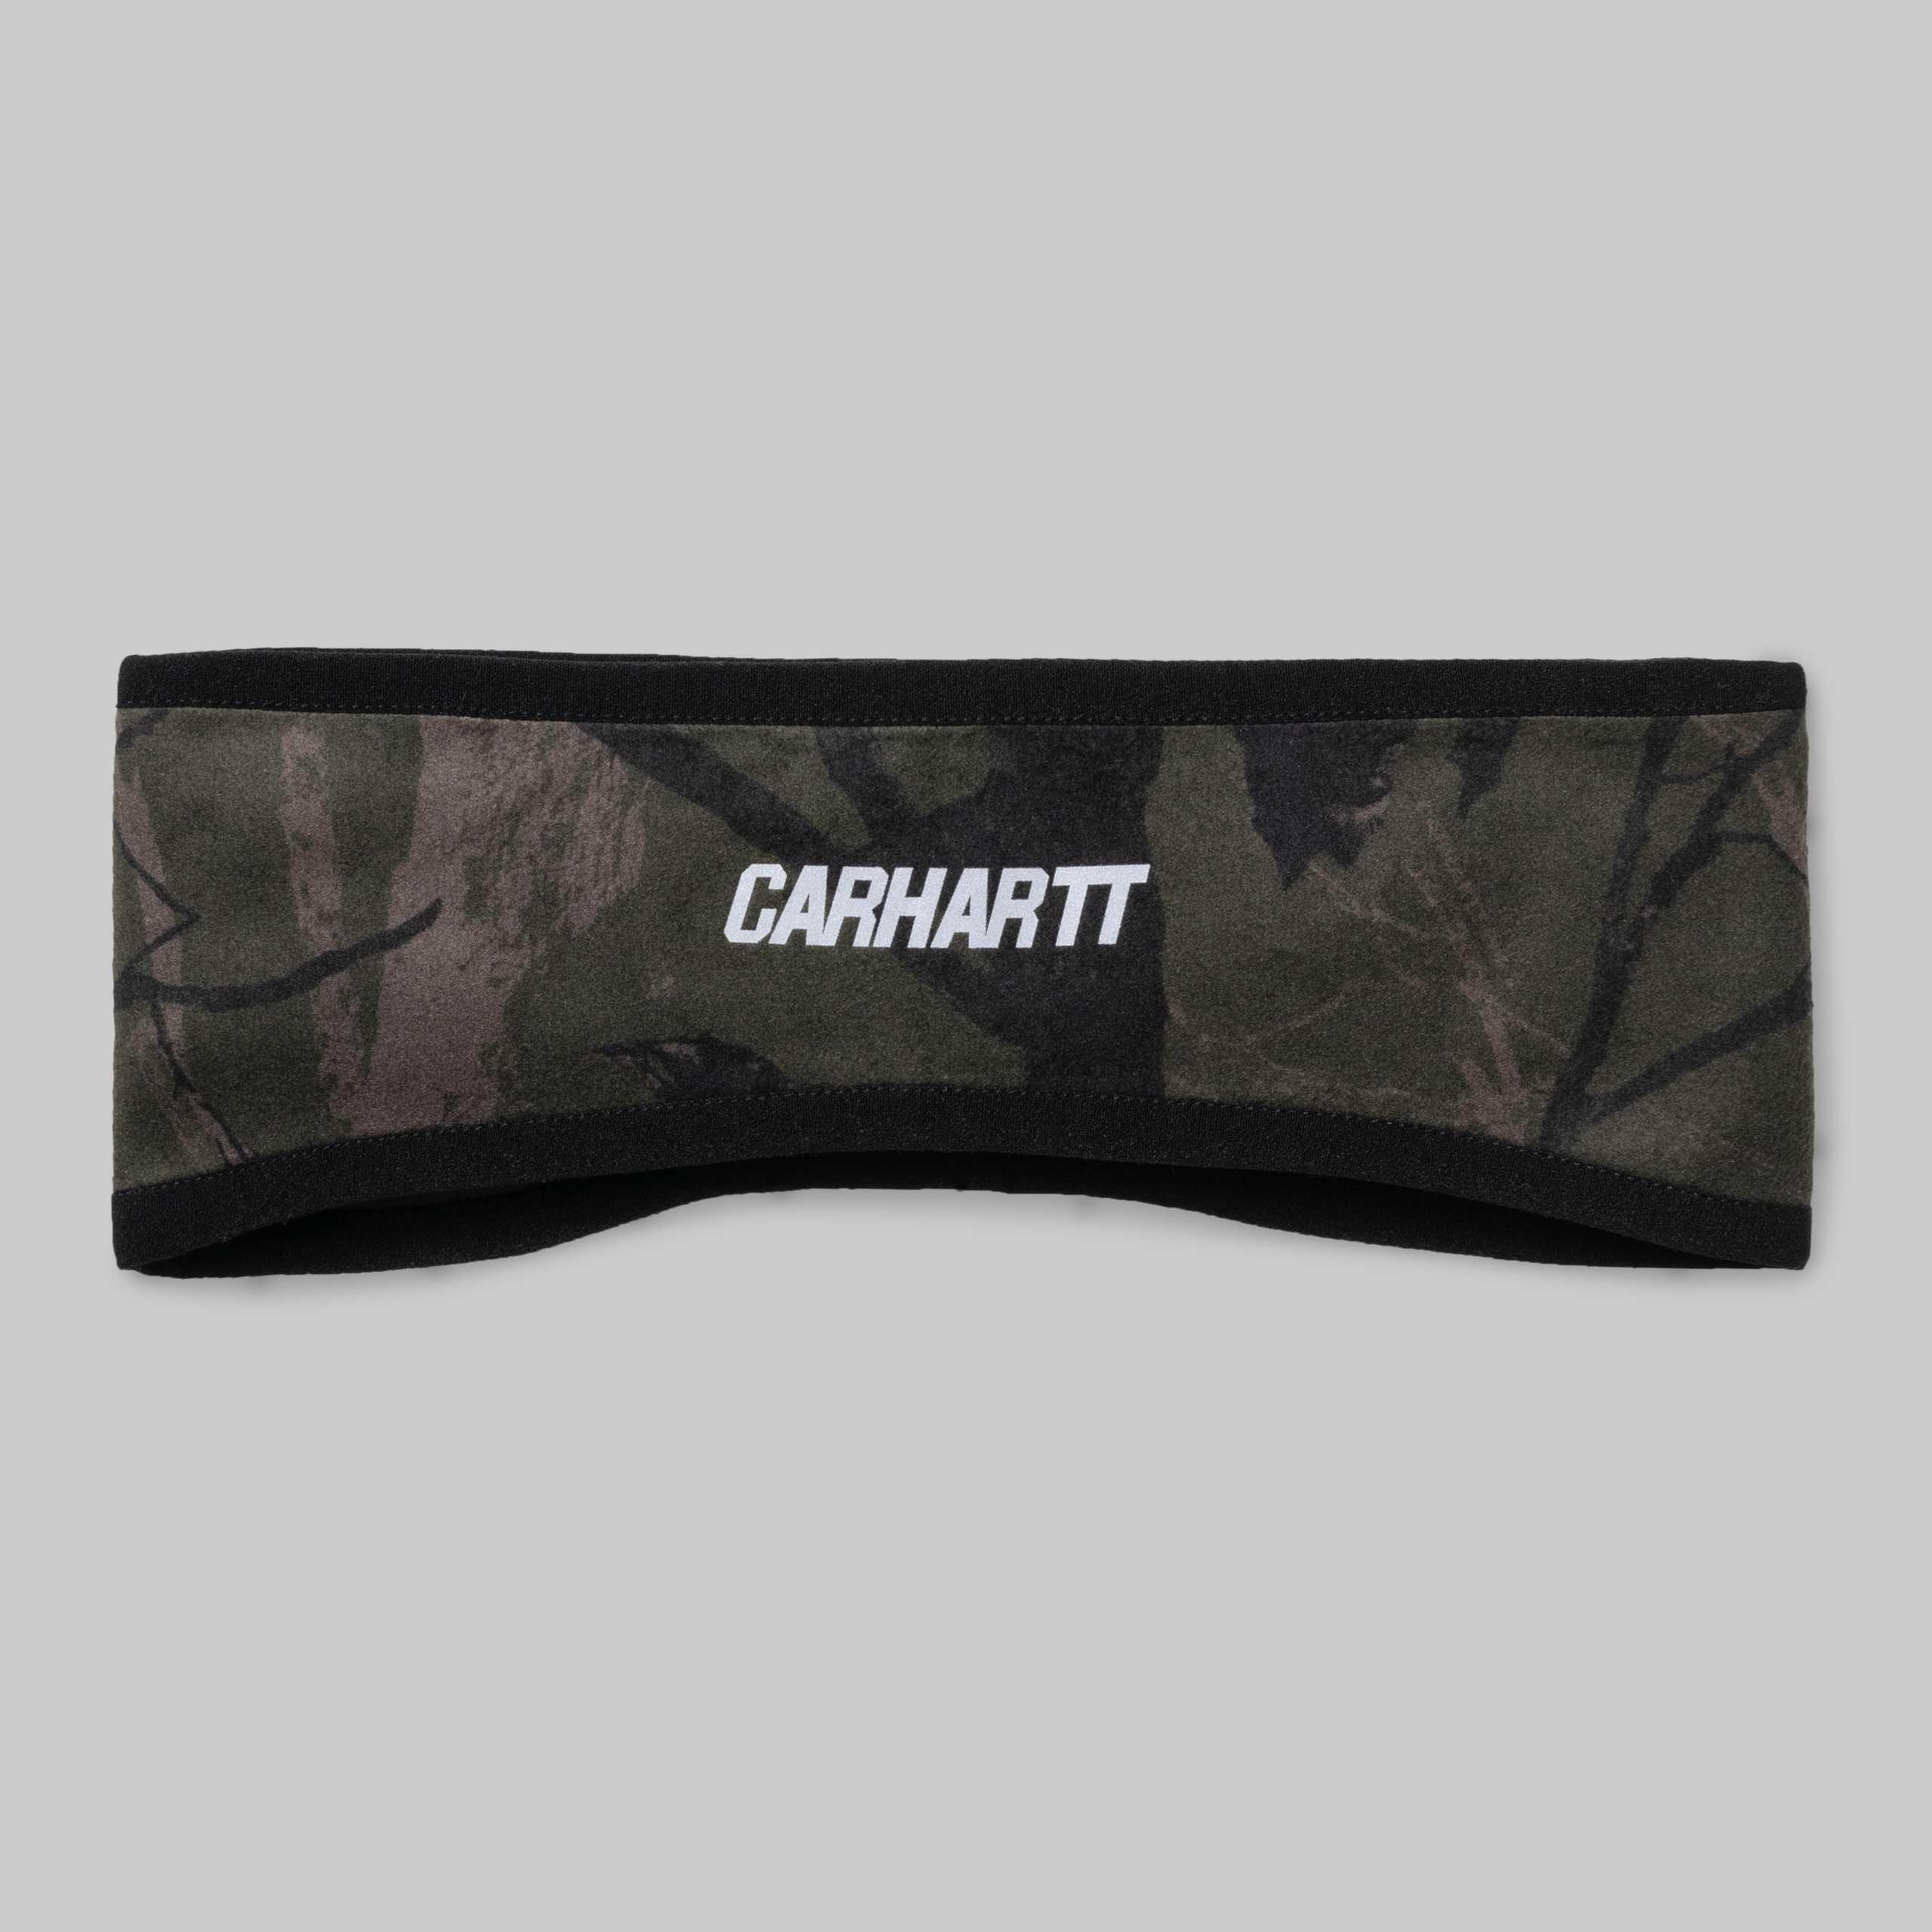 carhartt-lookbook-dtf-magazine-7